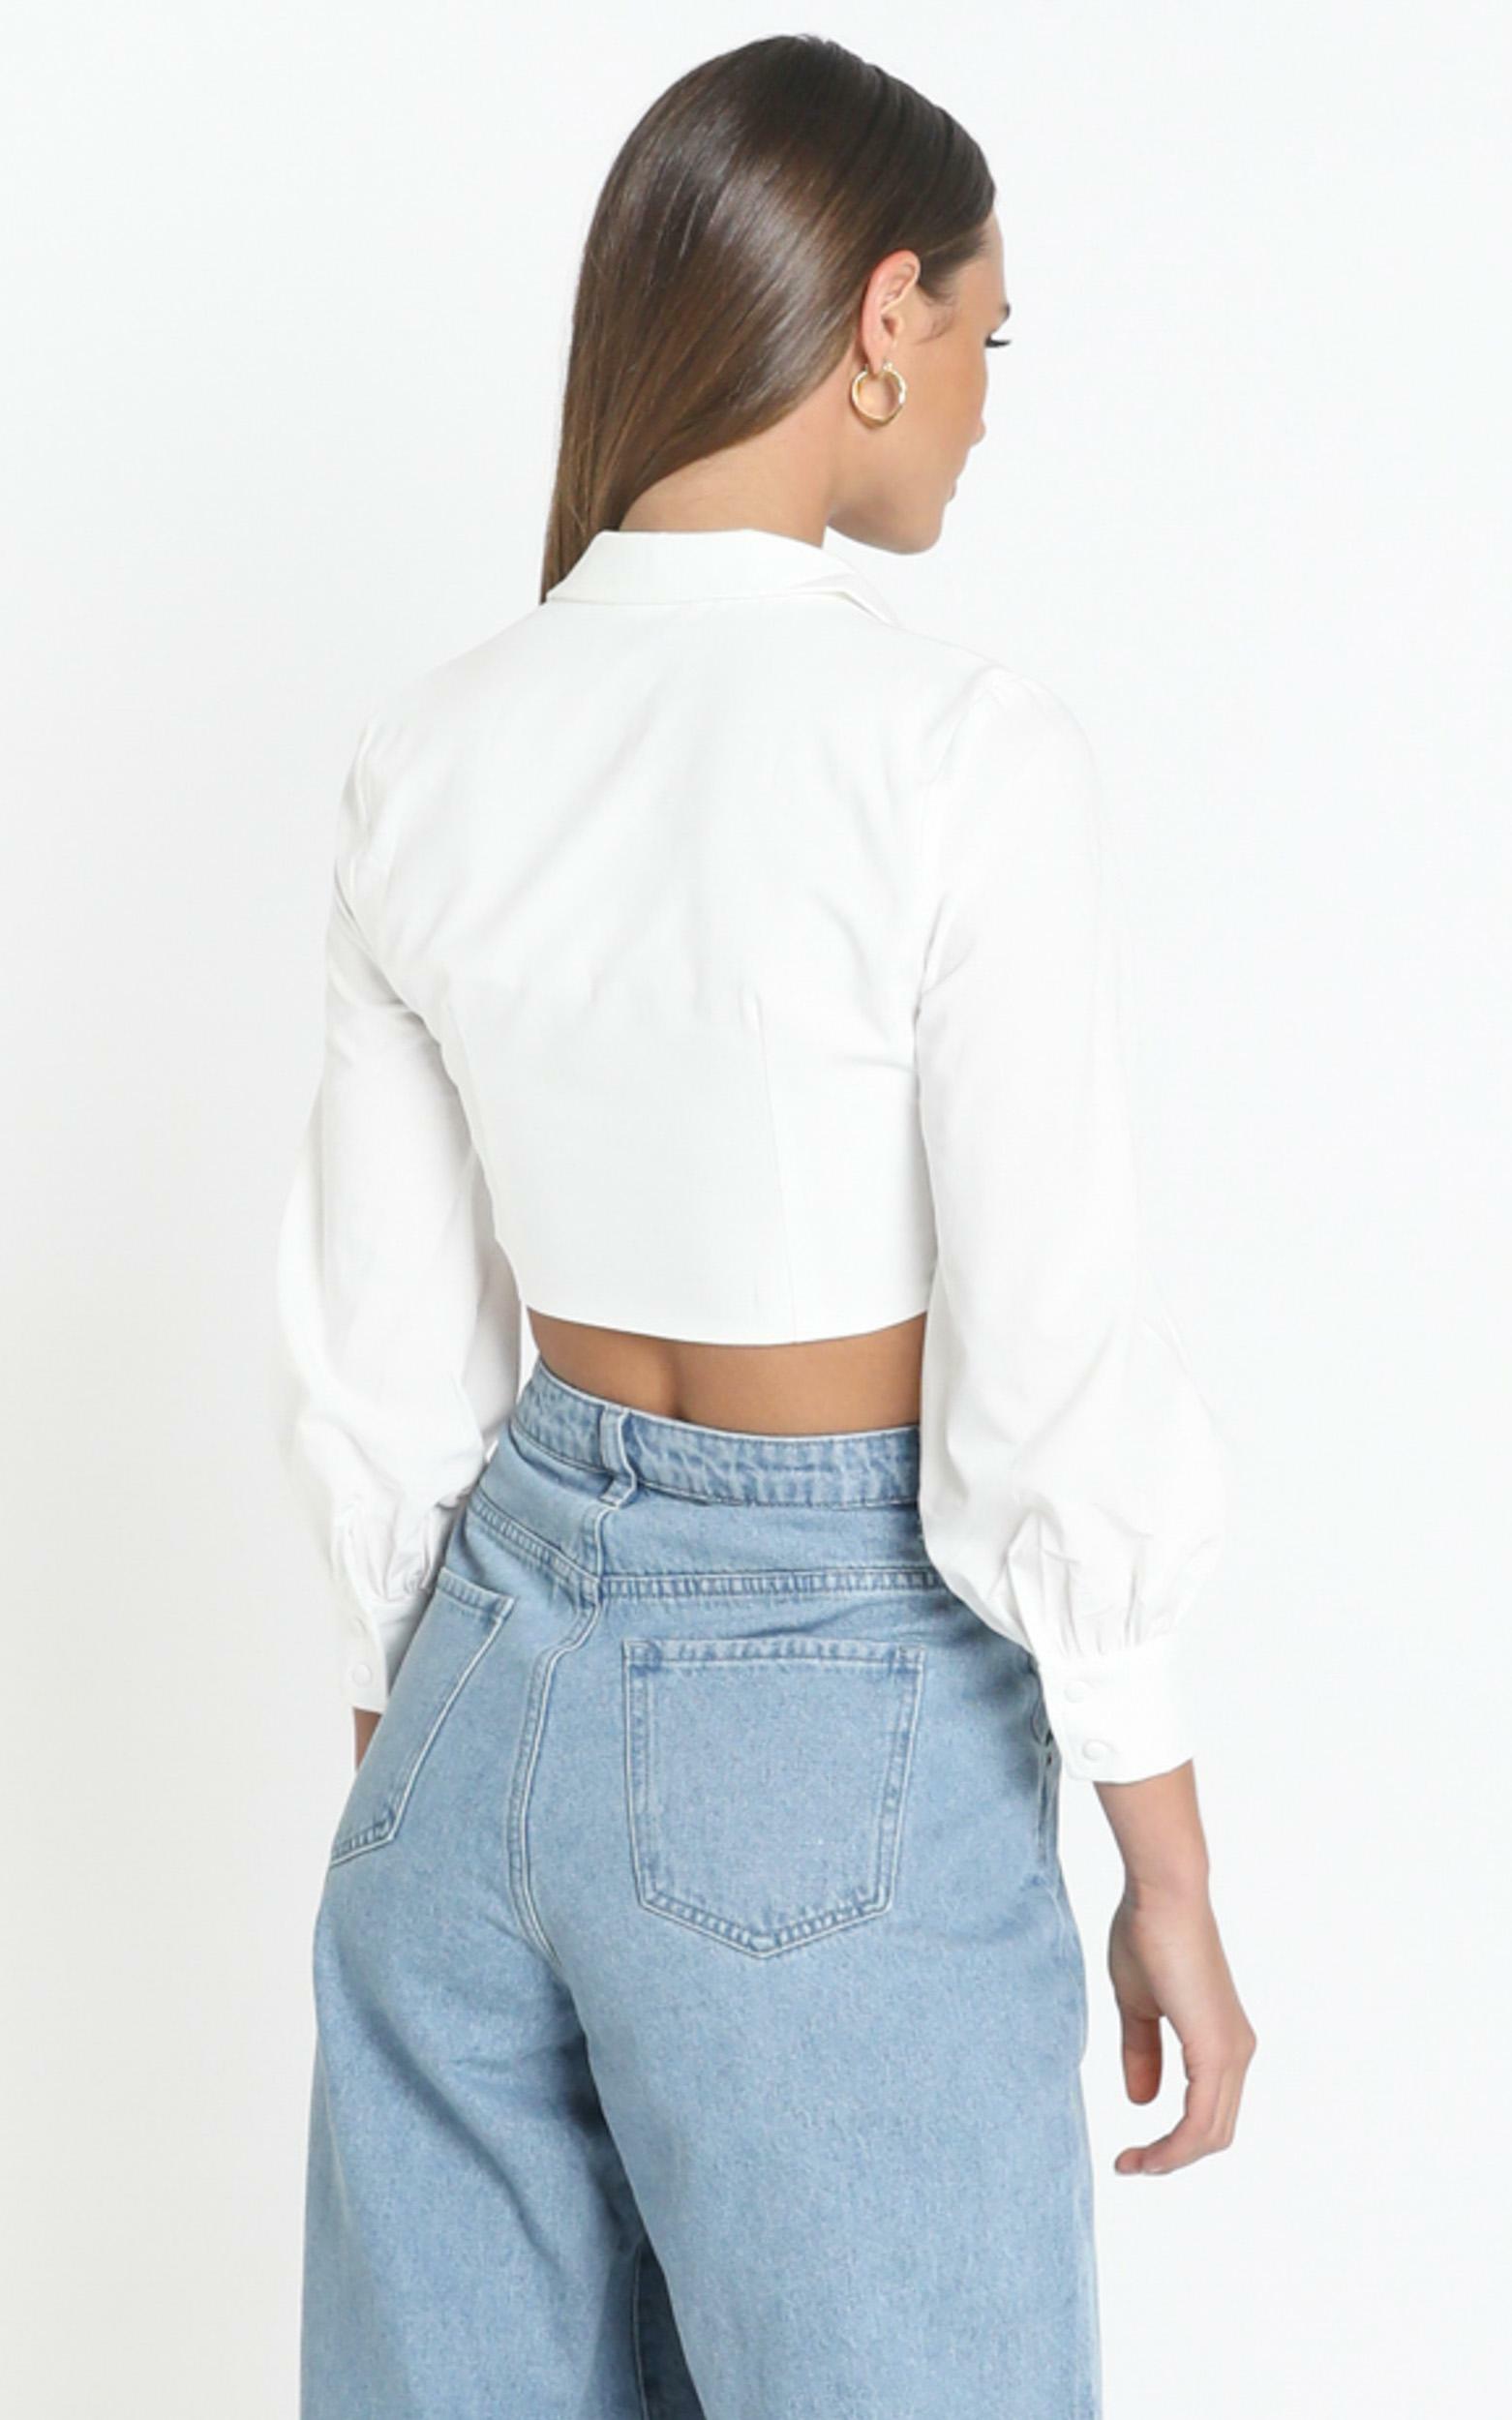 Shura Shirt in White - 12 (L), White, hi-res image number null